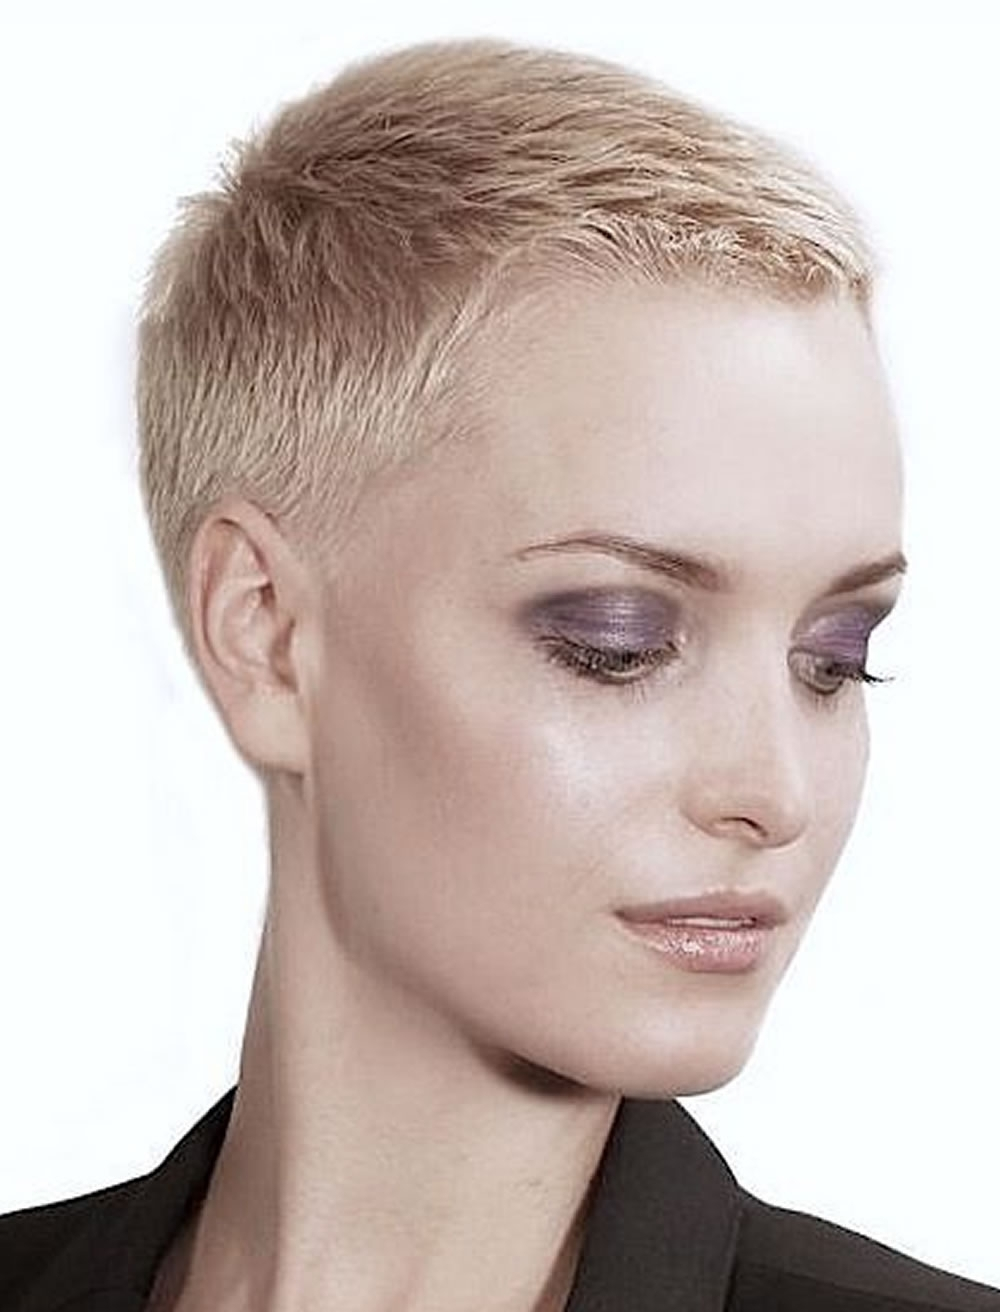 15 best very short pixie hairstyles